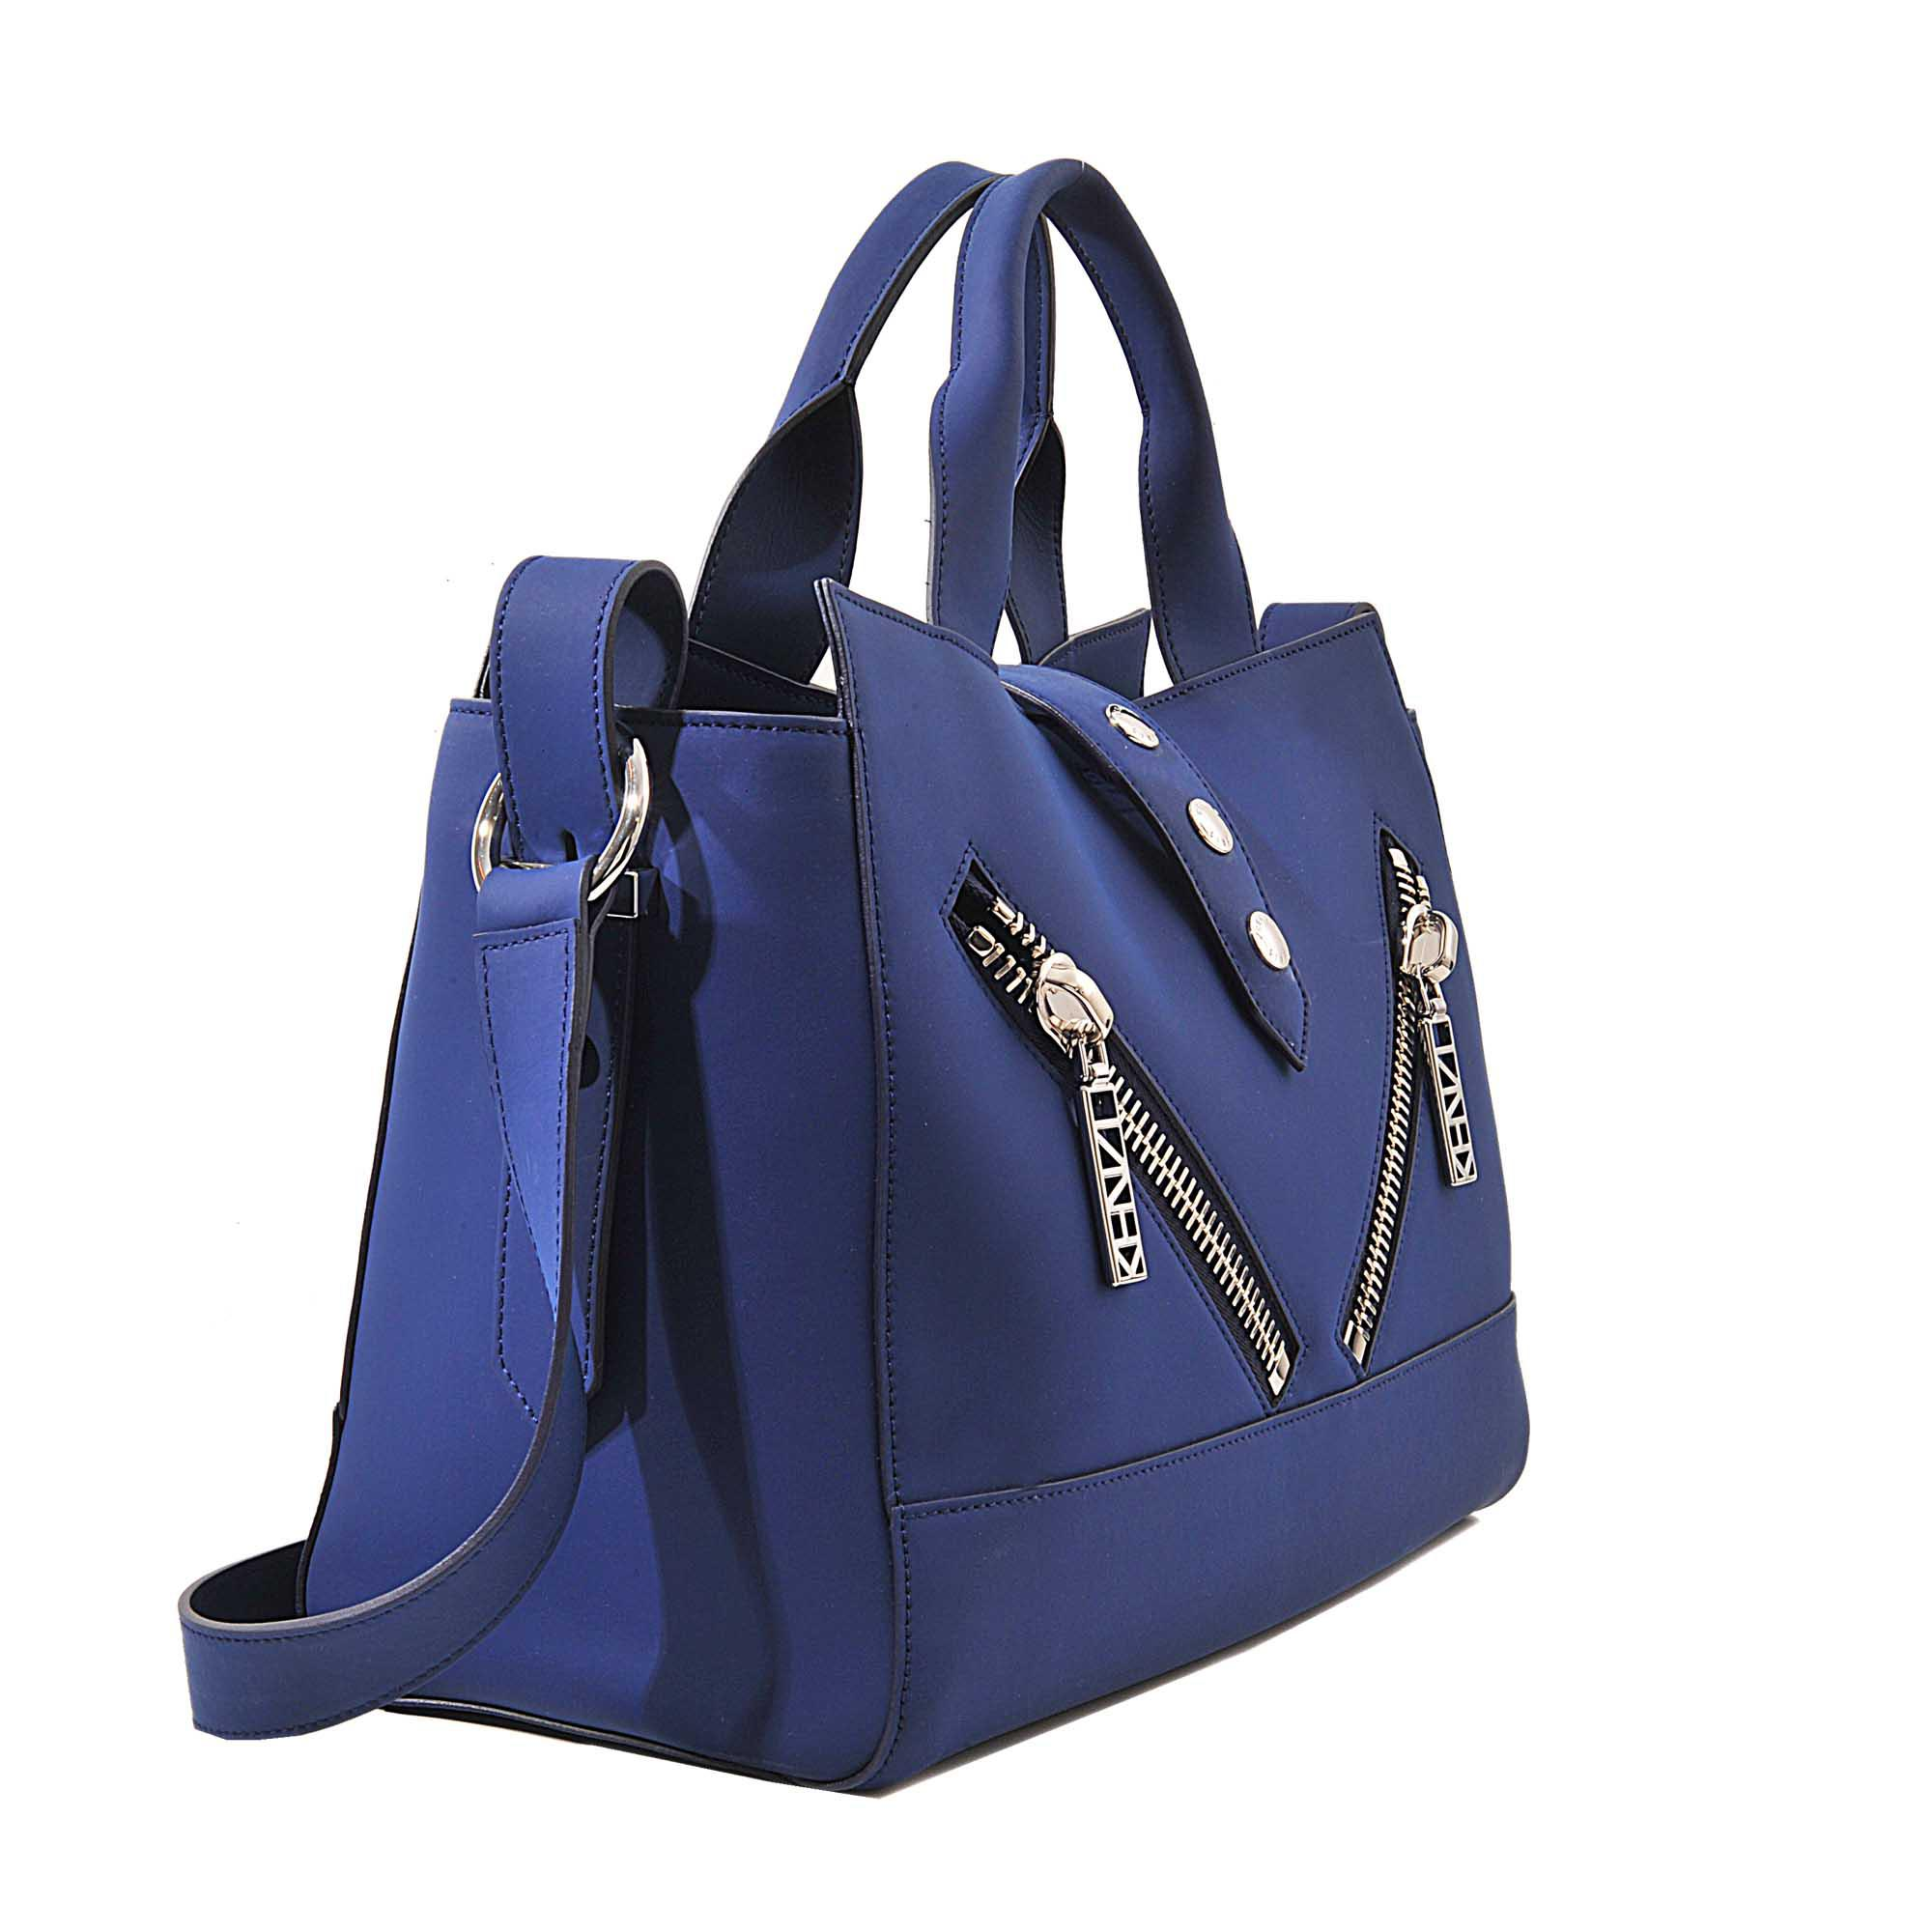 1aae433c KENZO Kalifornia Medium Tote Bag in Blue - Lyst